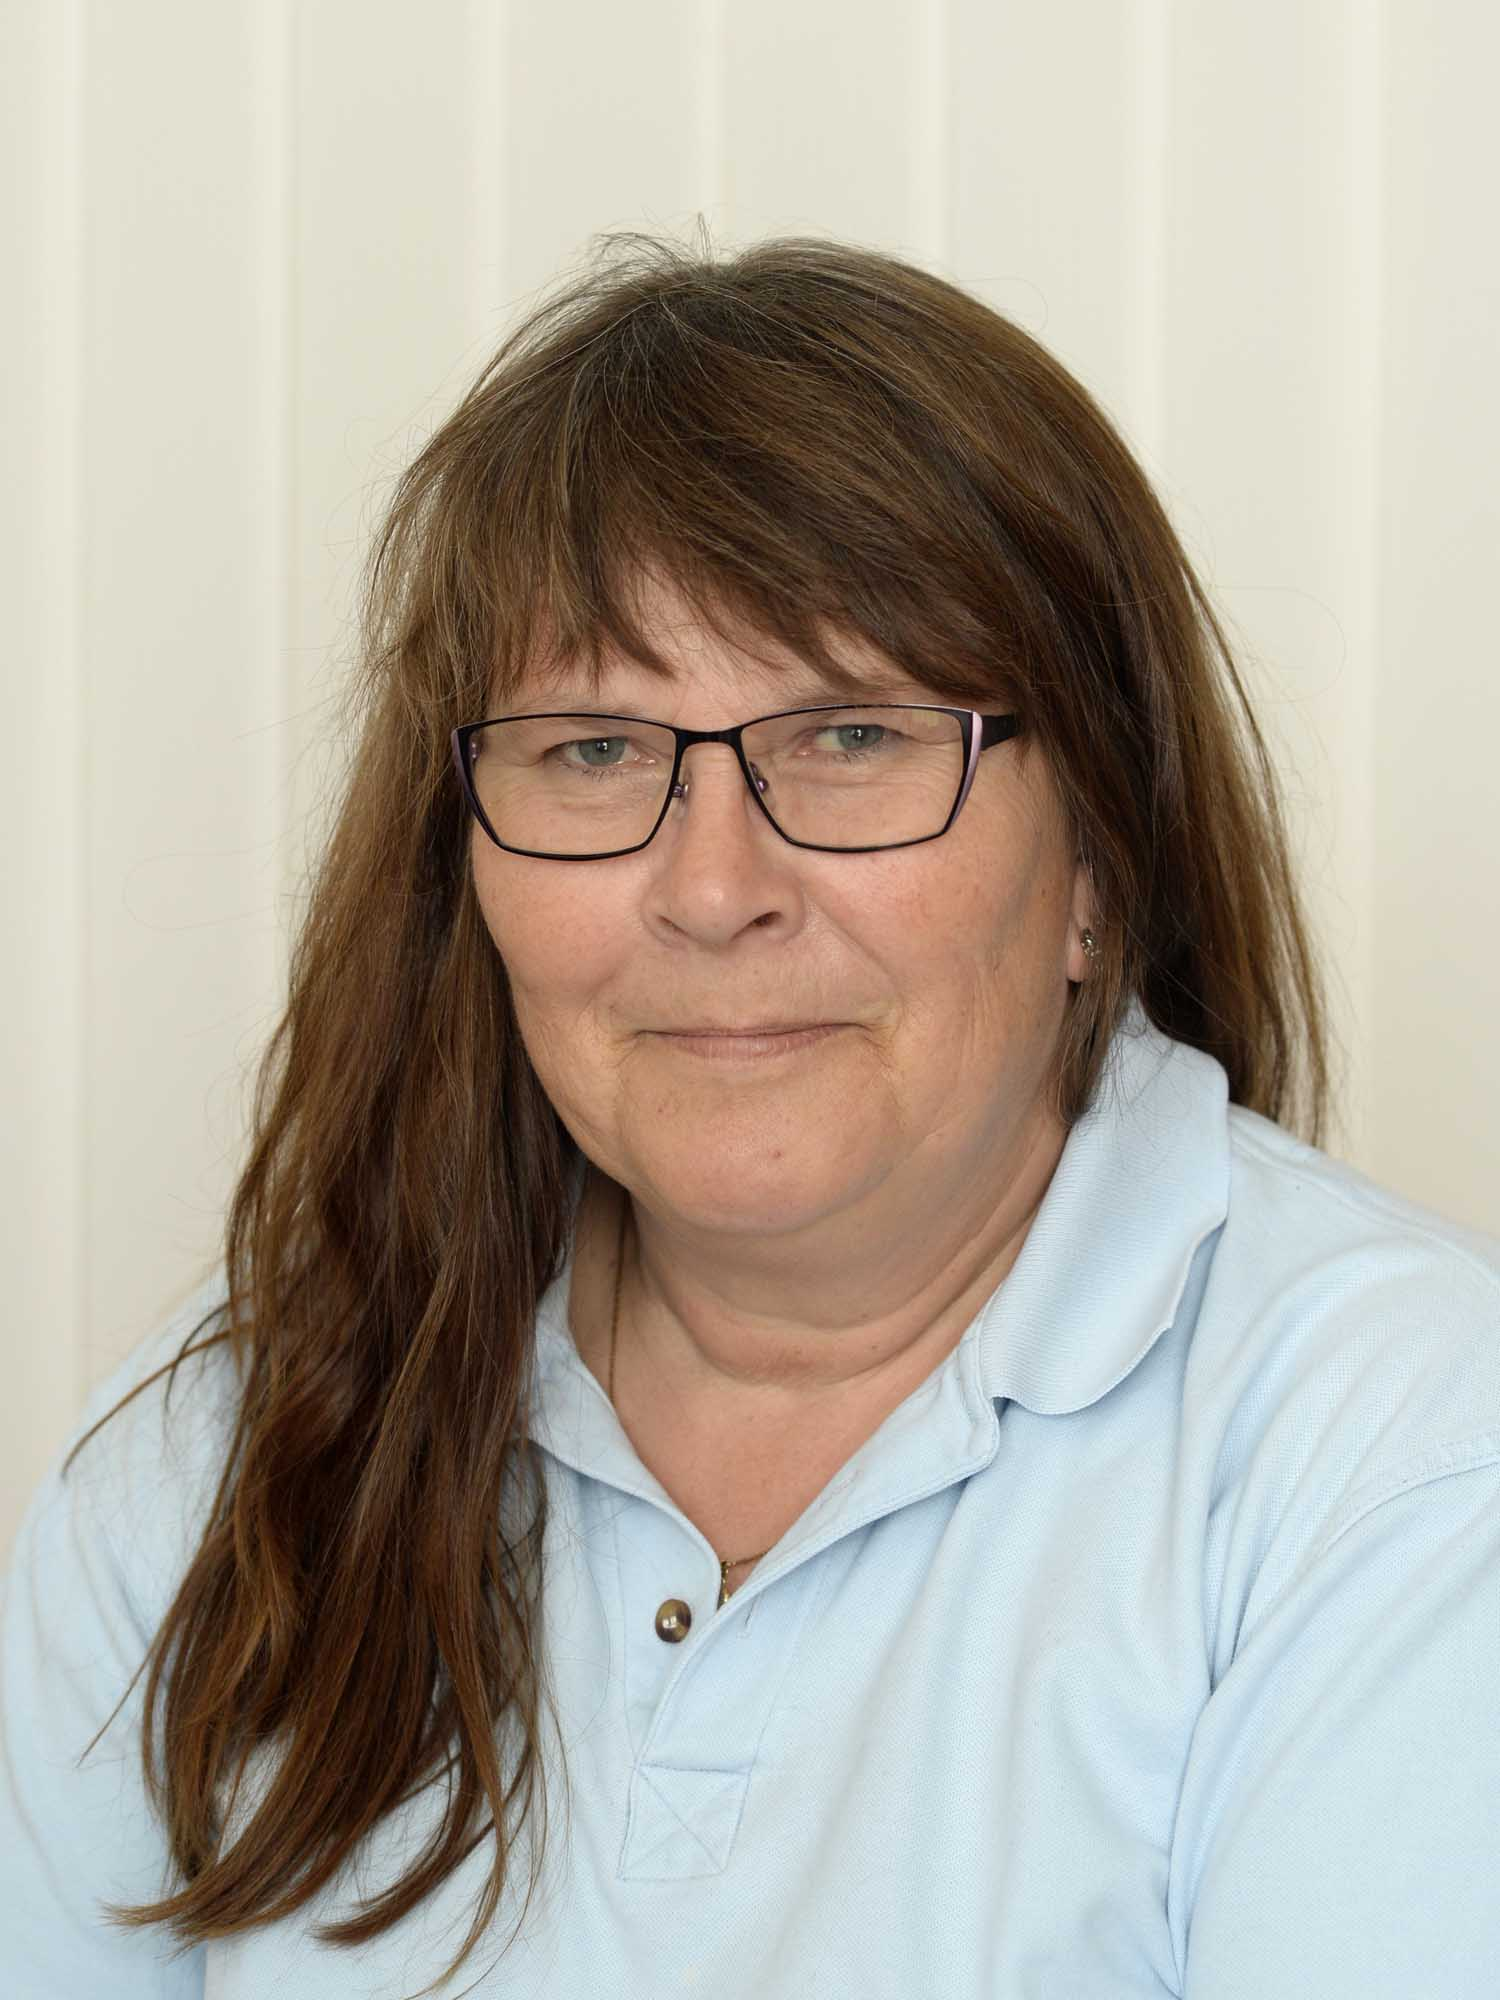 Anne Jorunn Kasin